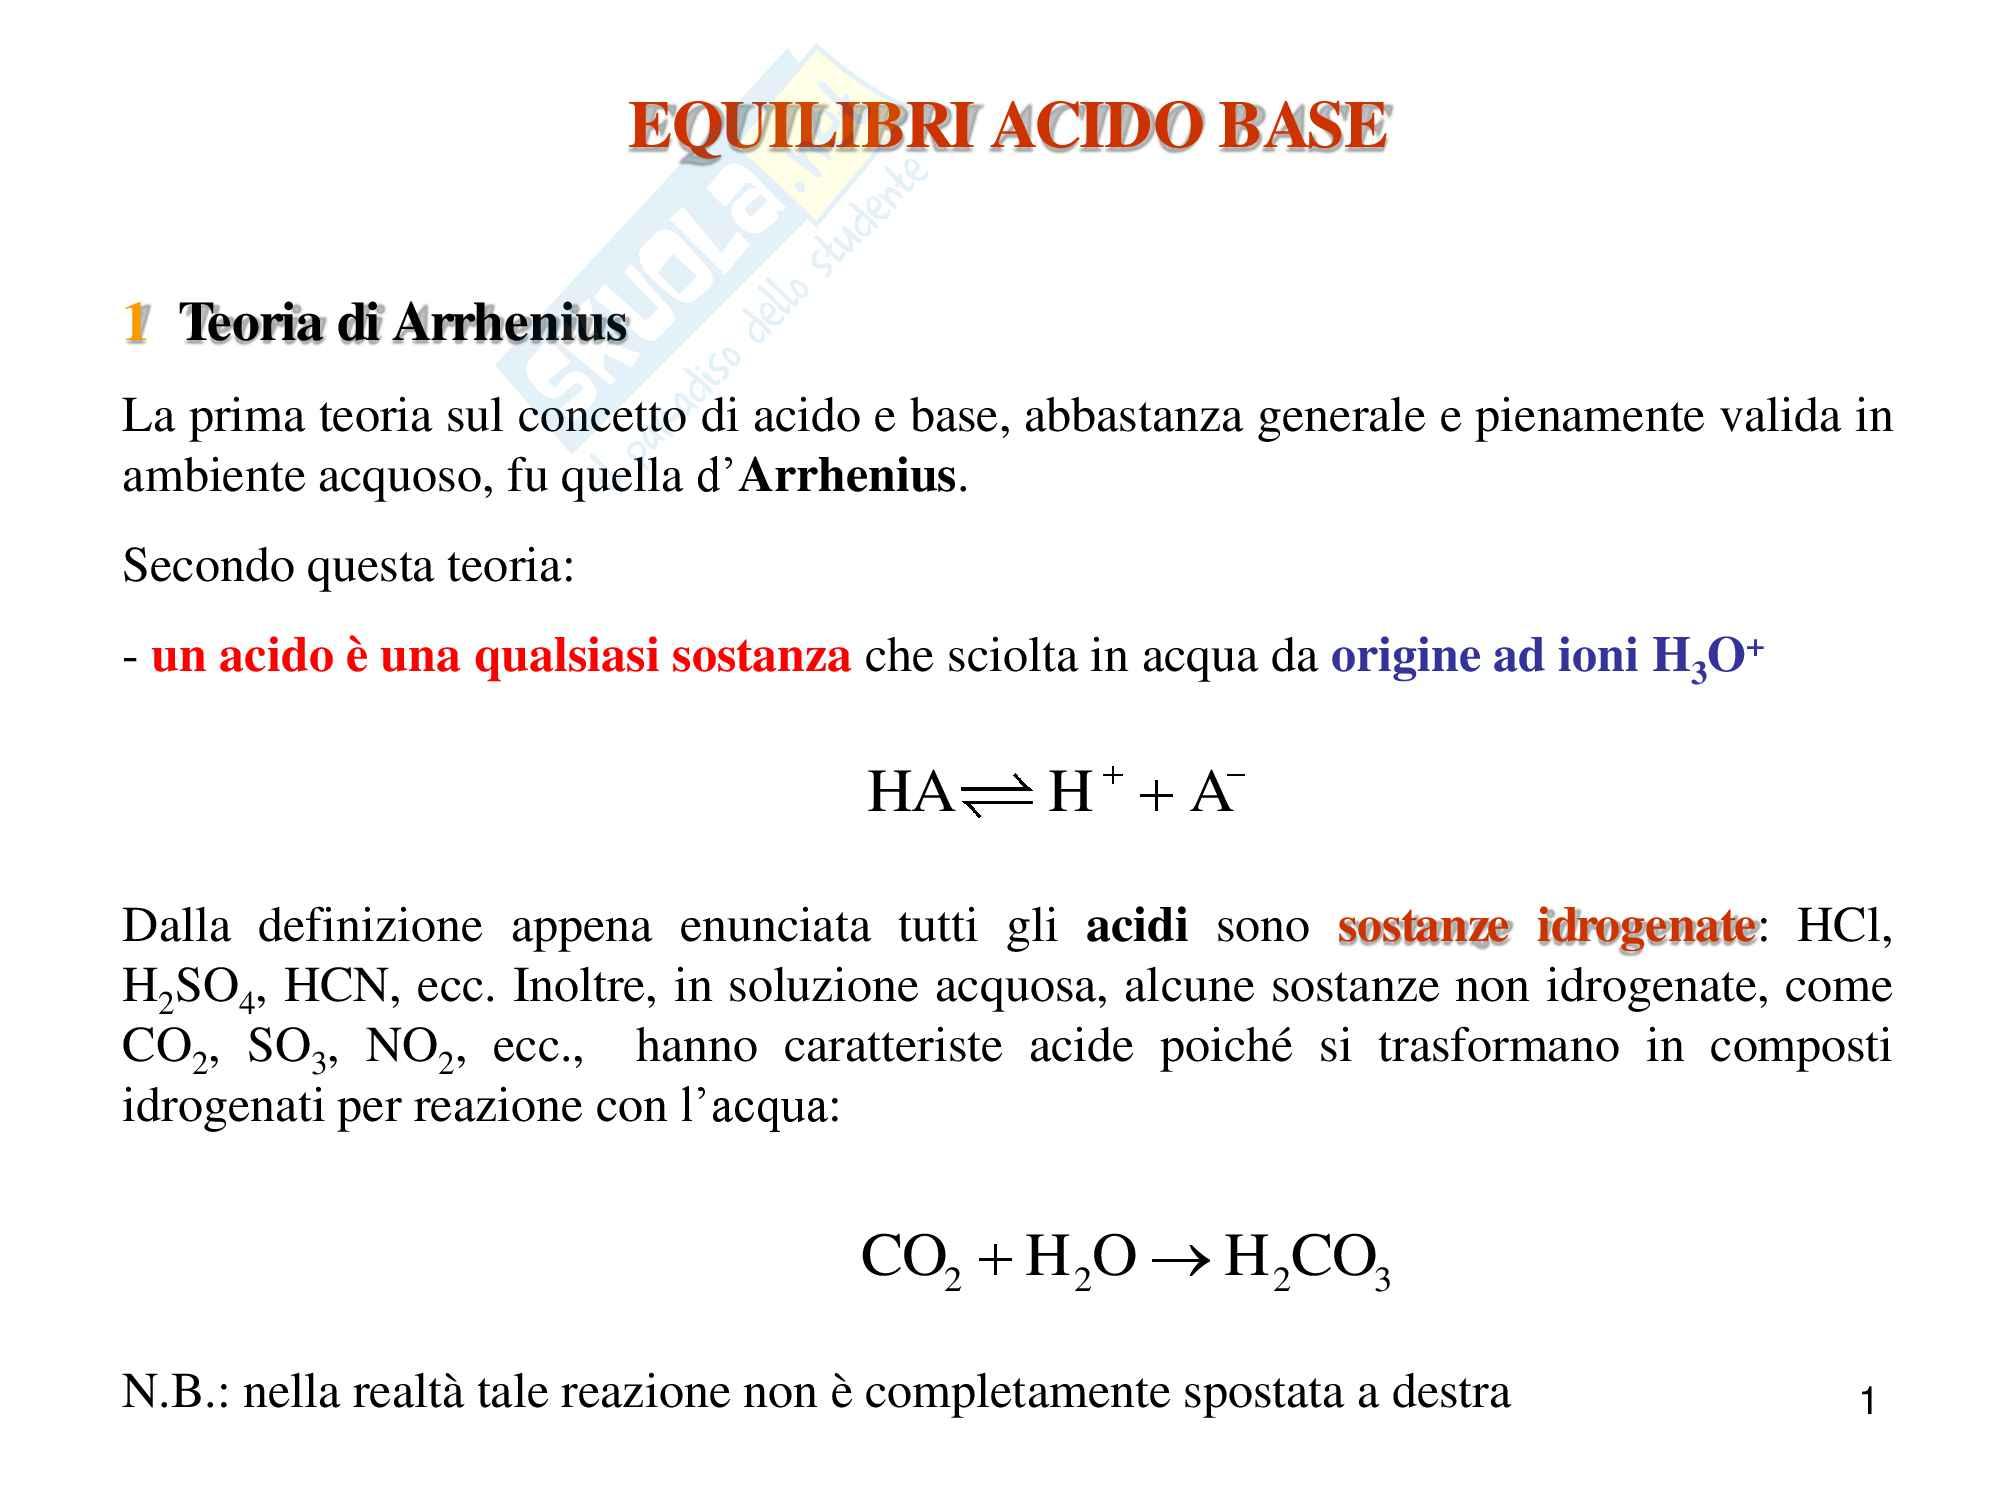 Chimica analitica, equilibrio acido base